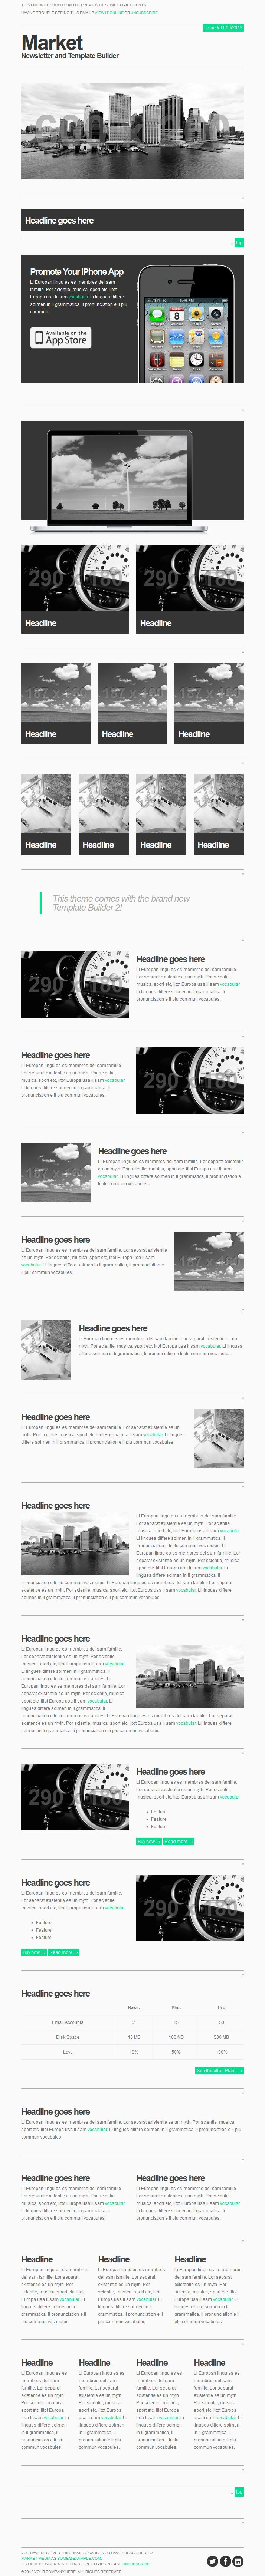 Market responsive newsletter with template builder by everpress 01market newsletter and template builderg 02market newsletter and template builder v01g maxwellsz